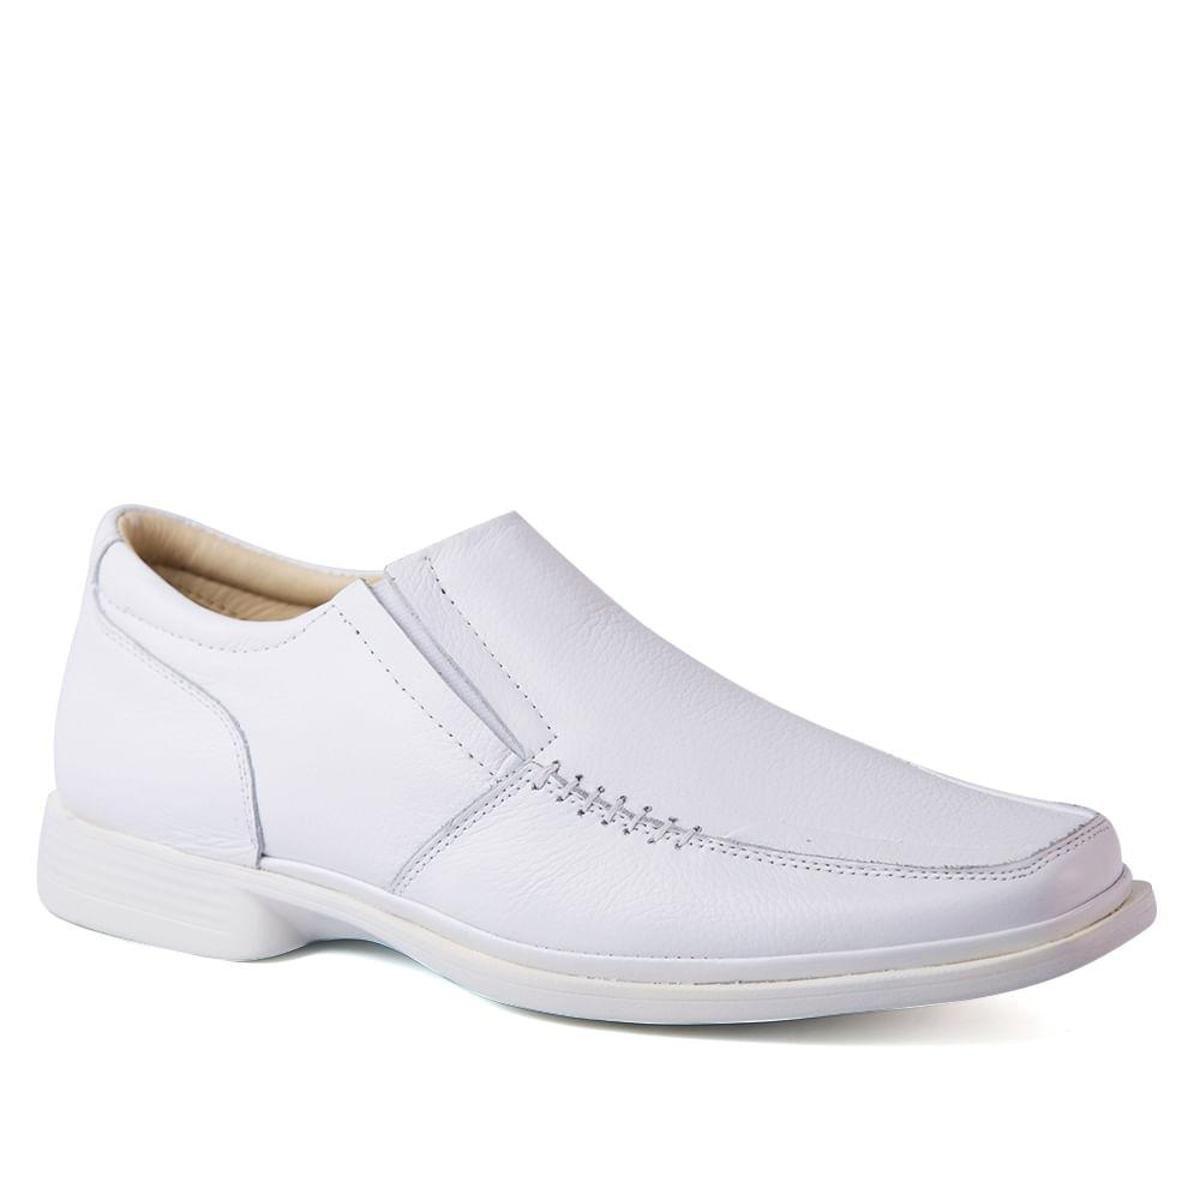 87b4229610 Sapato Masculino Anti Impacto 549201 em Couro Floater Doctor Shoes | Zattini